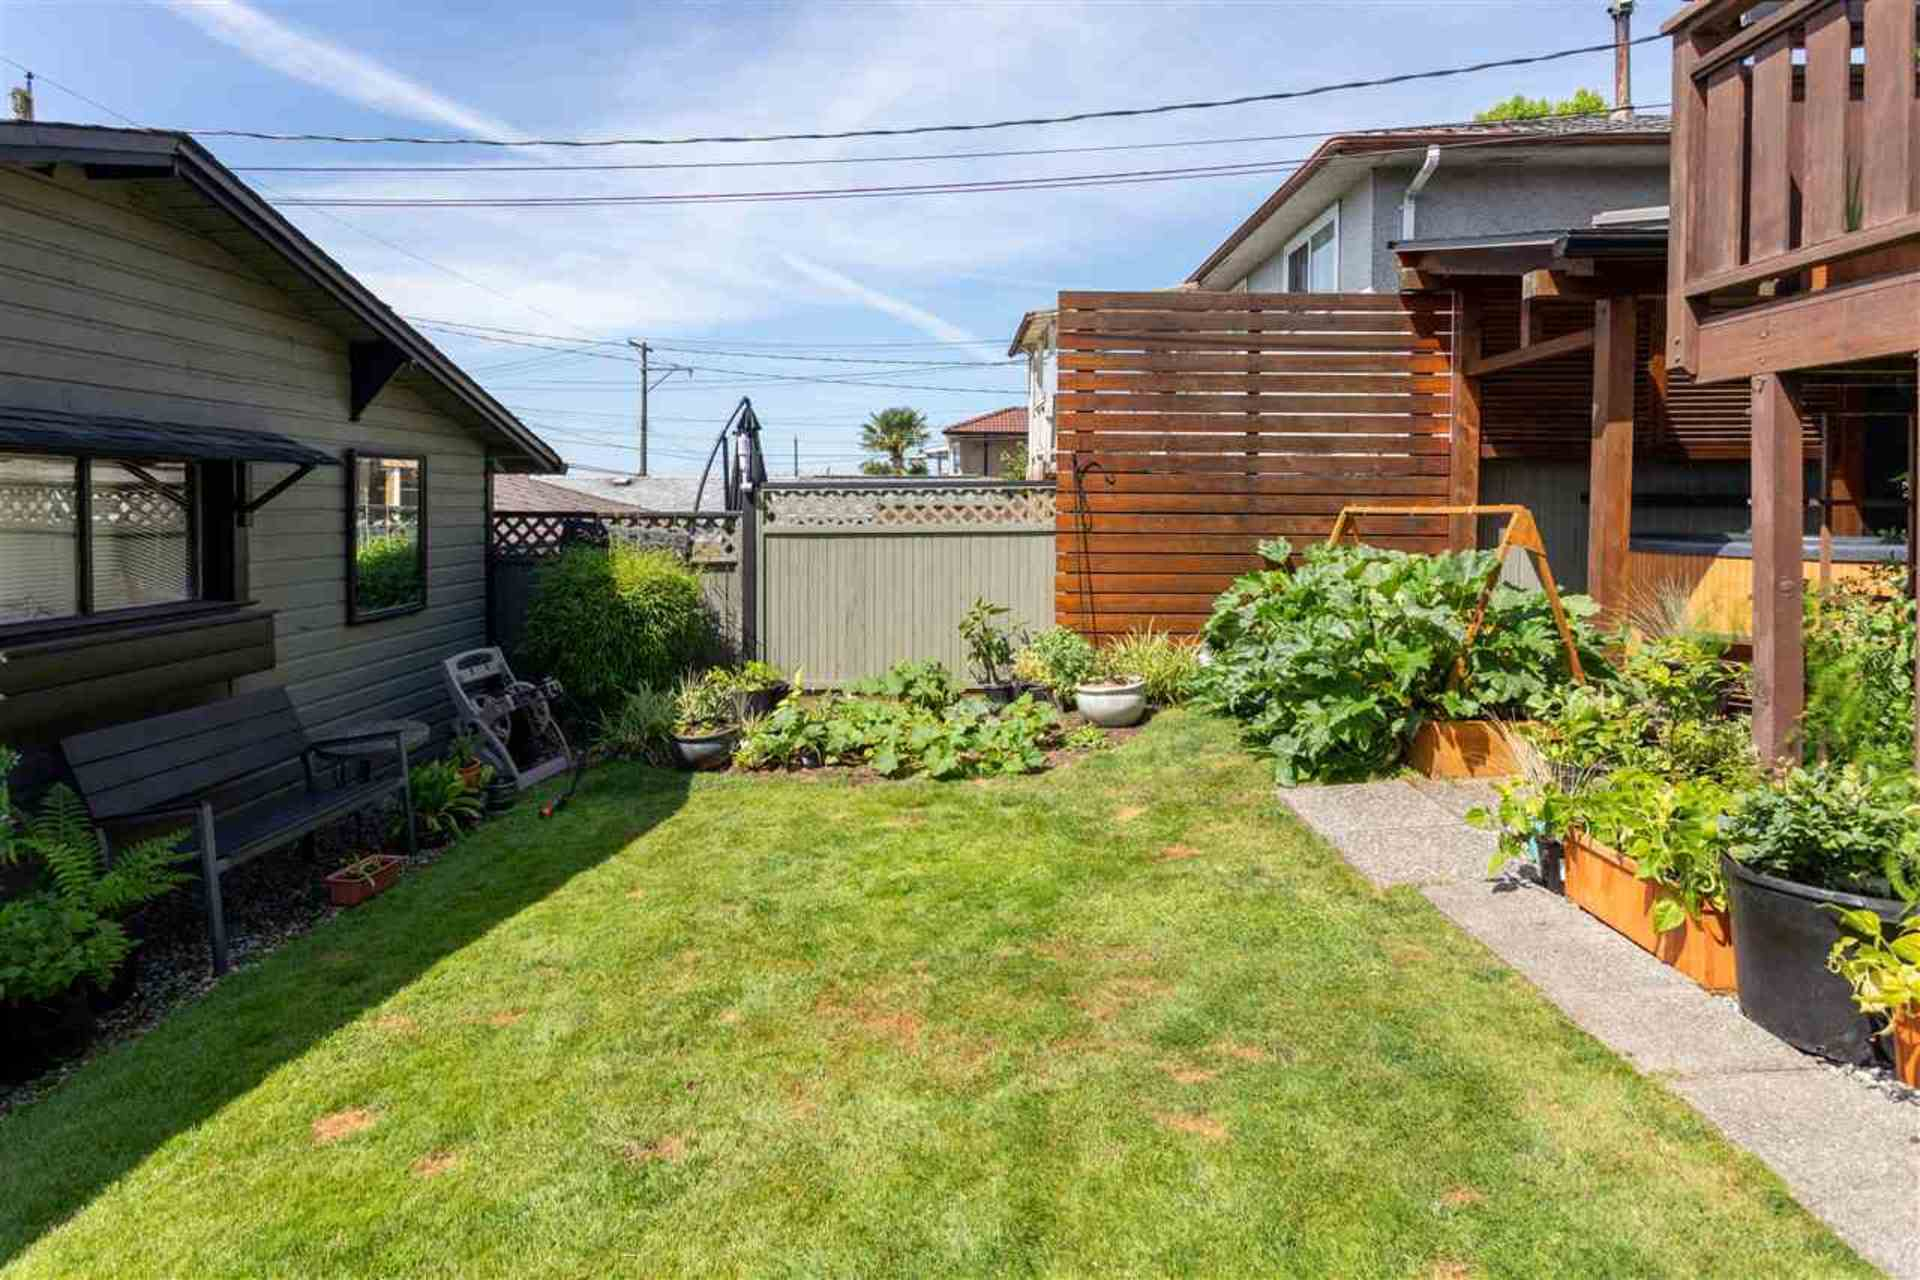 3912-parker-street-willingdon-heights-burnaby-north-37 at 3912 Parker Street, Willingdon Heights, Burnaby North